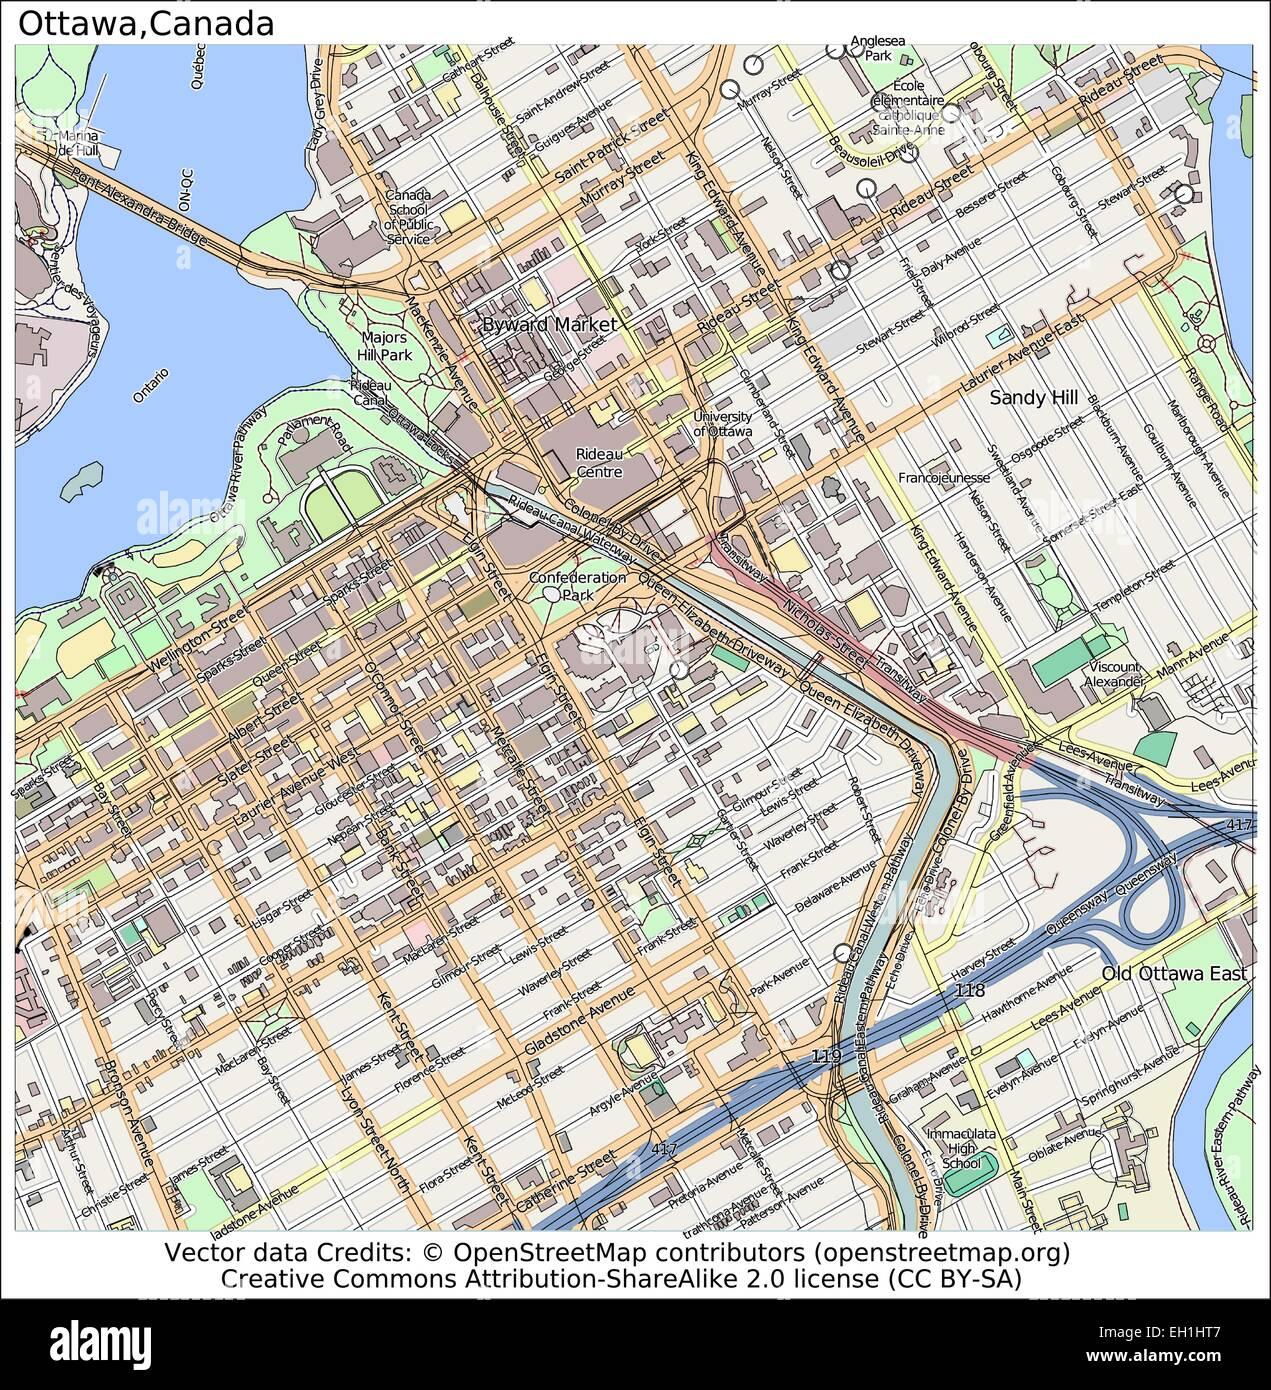 Map Of Ottawa Canada.Ottawa Canada City Map Stock Vector Art Illustration Vector Image